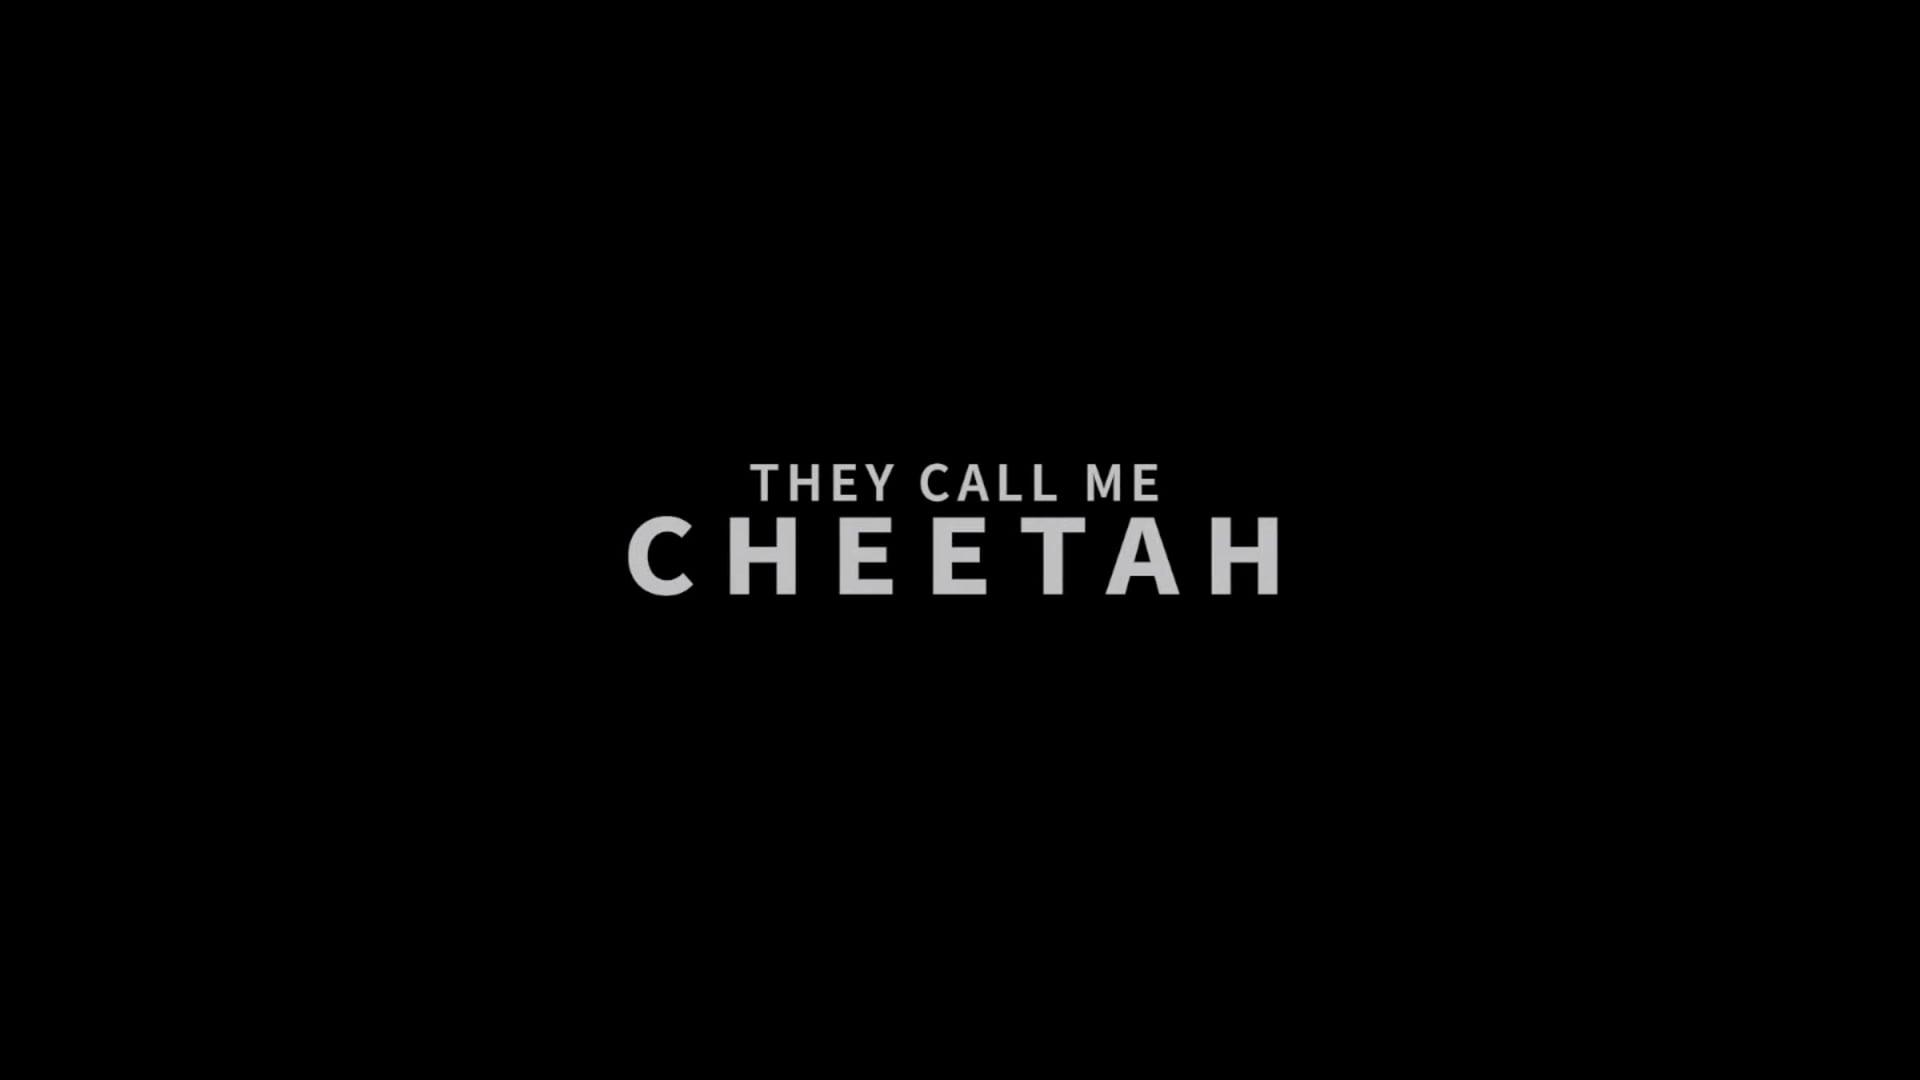 THEY CALL ME CHEETAH